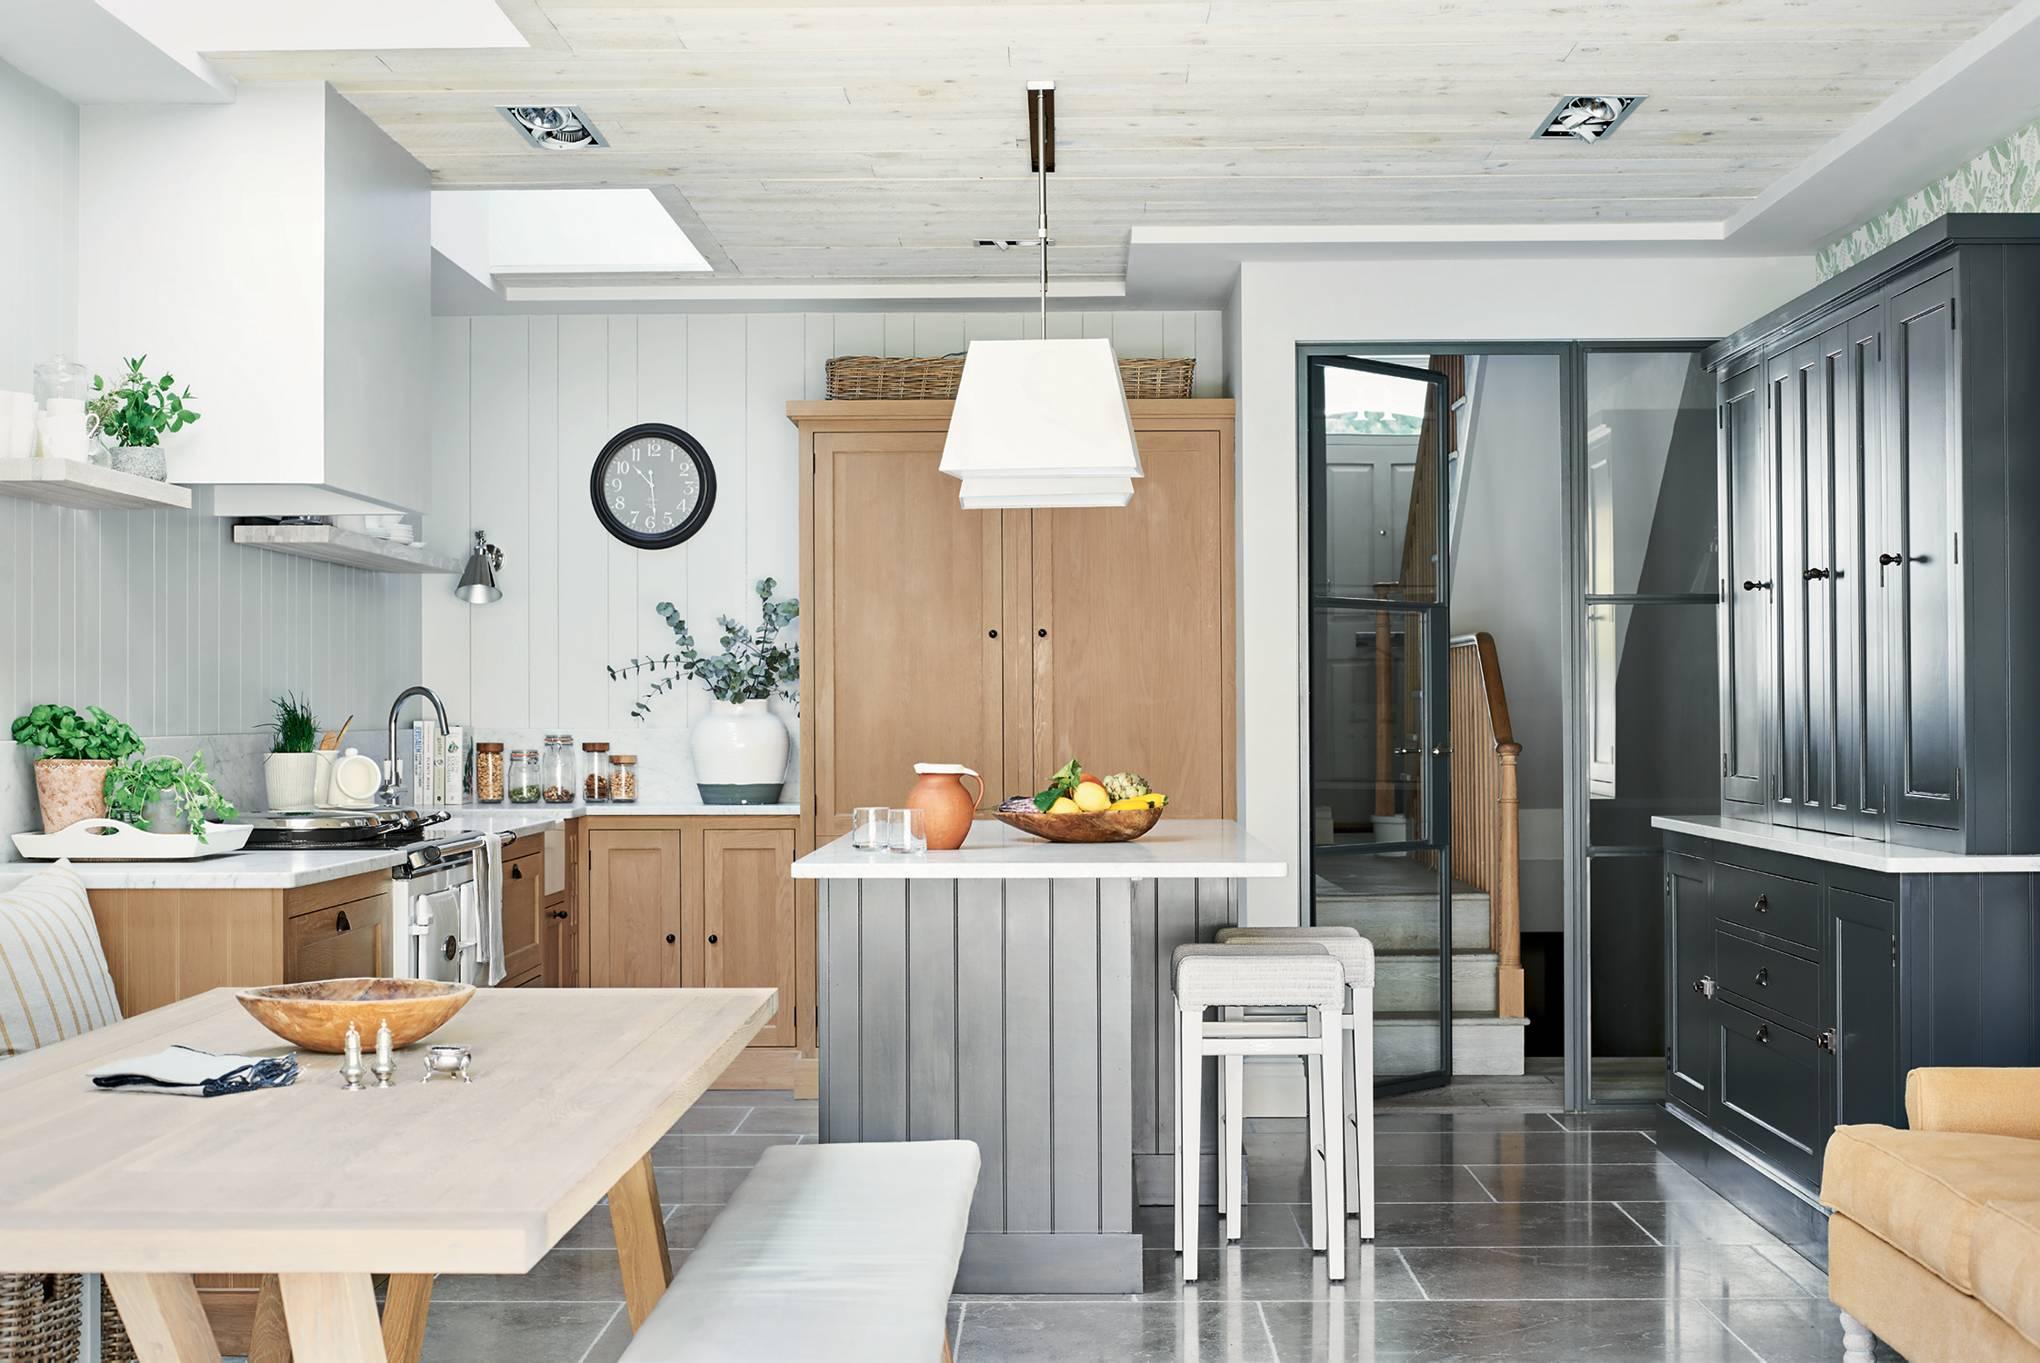 20 kitchen dining room ideas   House & Garden